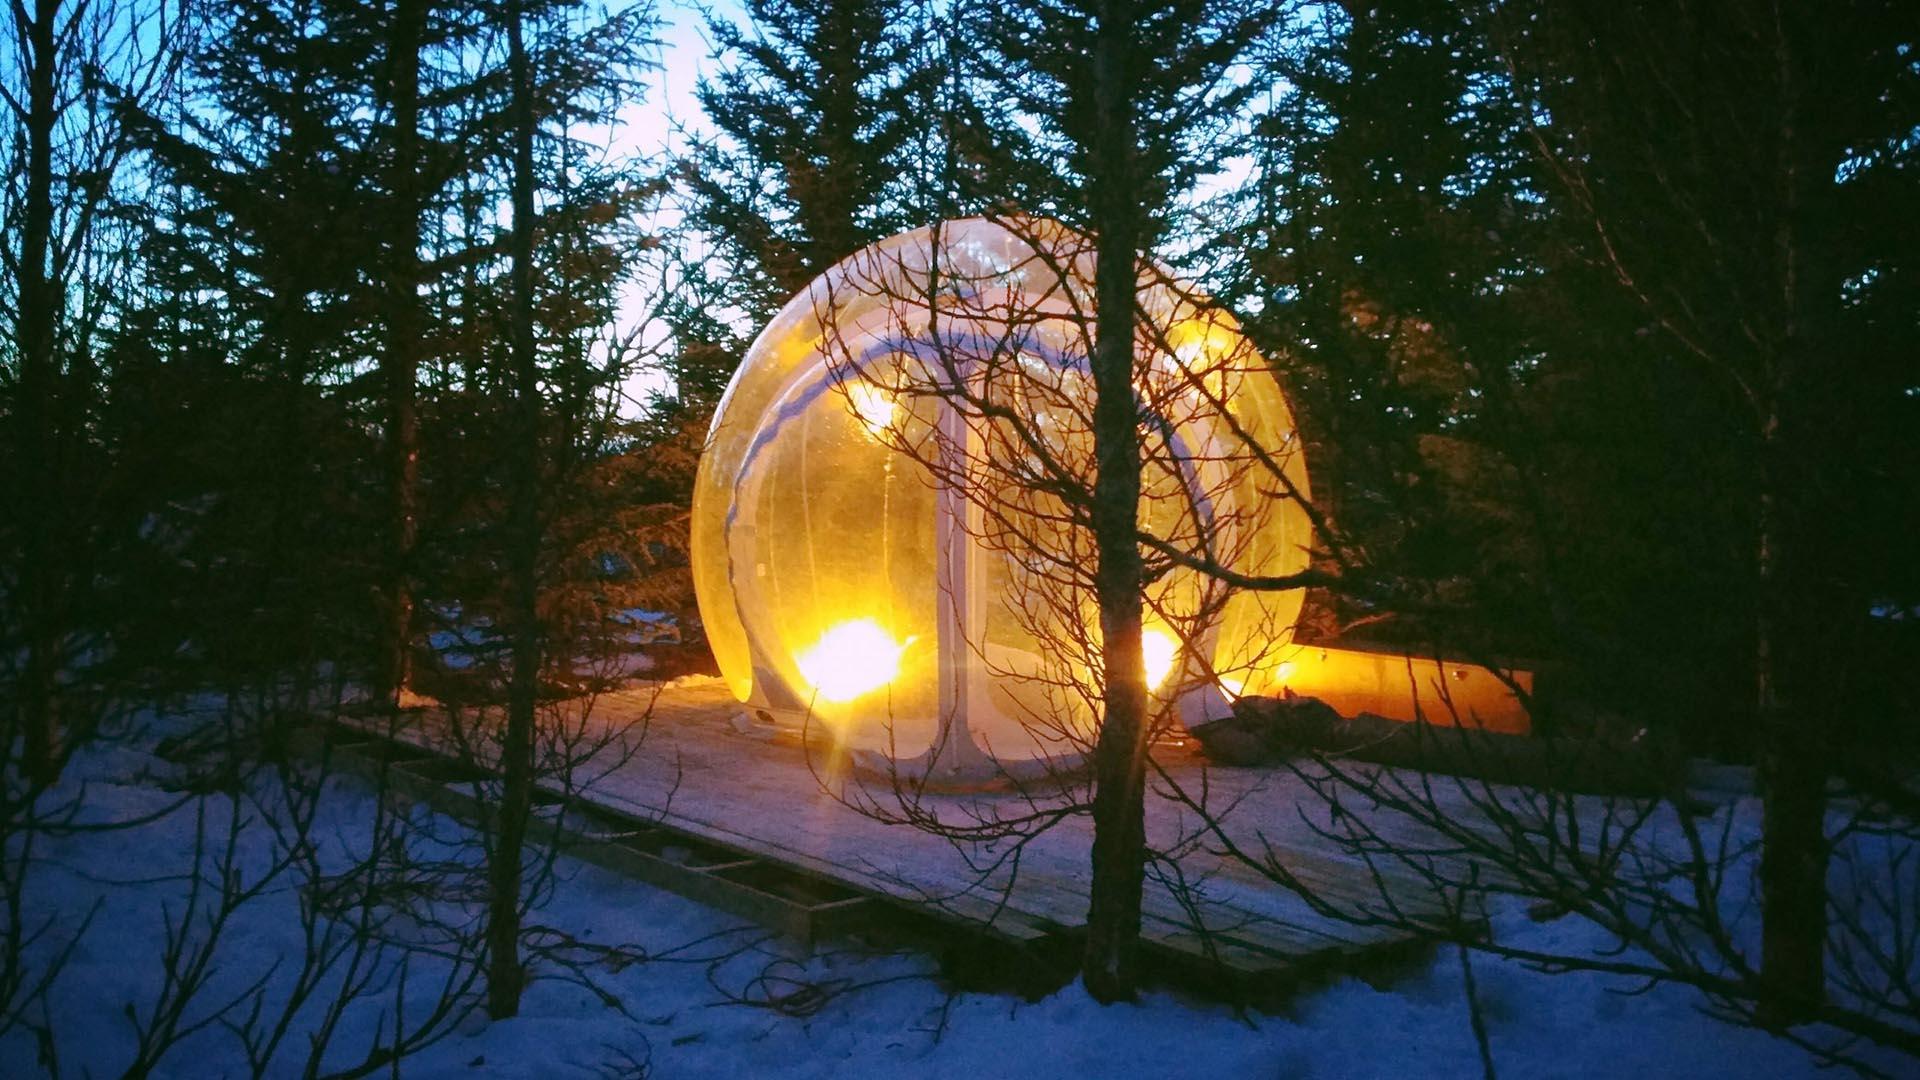 ijsland-5-million-star-hotel